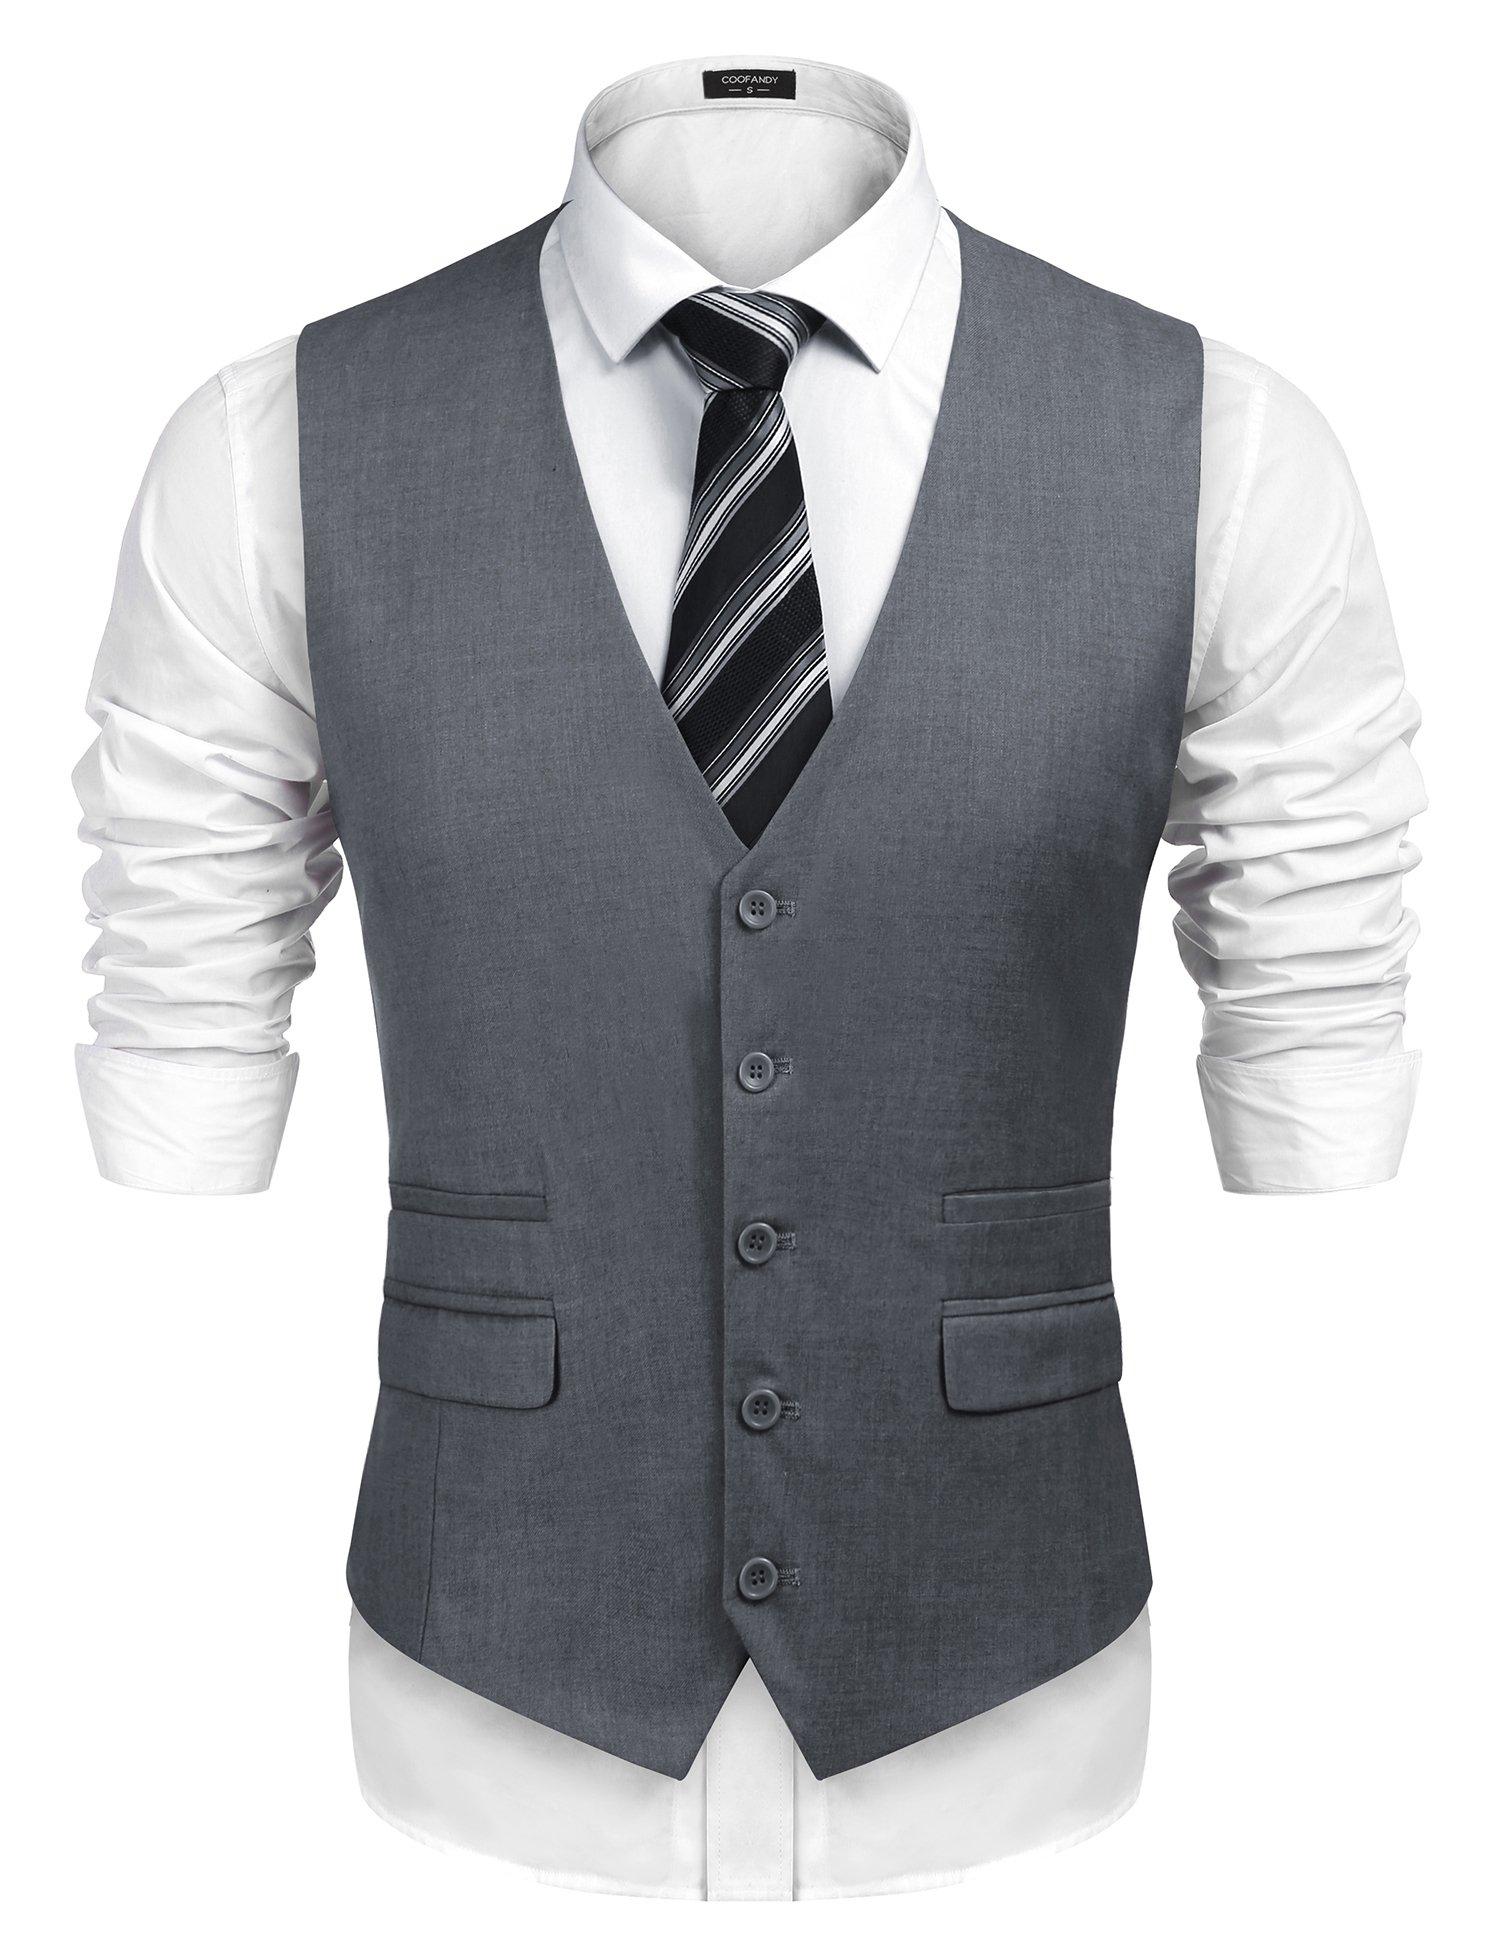 COOFANDY Men's Business Suit Vest,Slim Fit Formal Skinny Wedding Waistcoat,Grey,Small